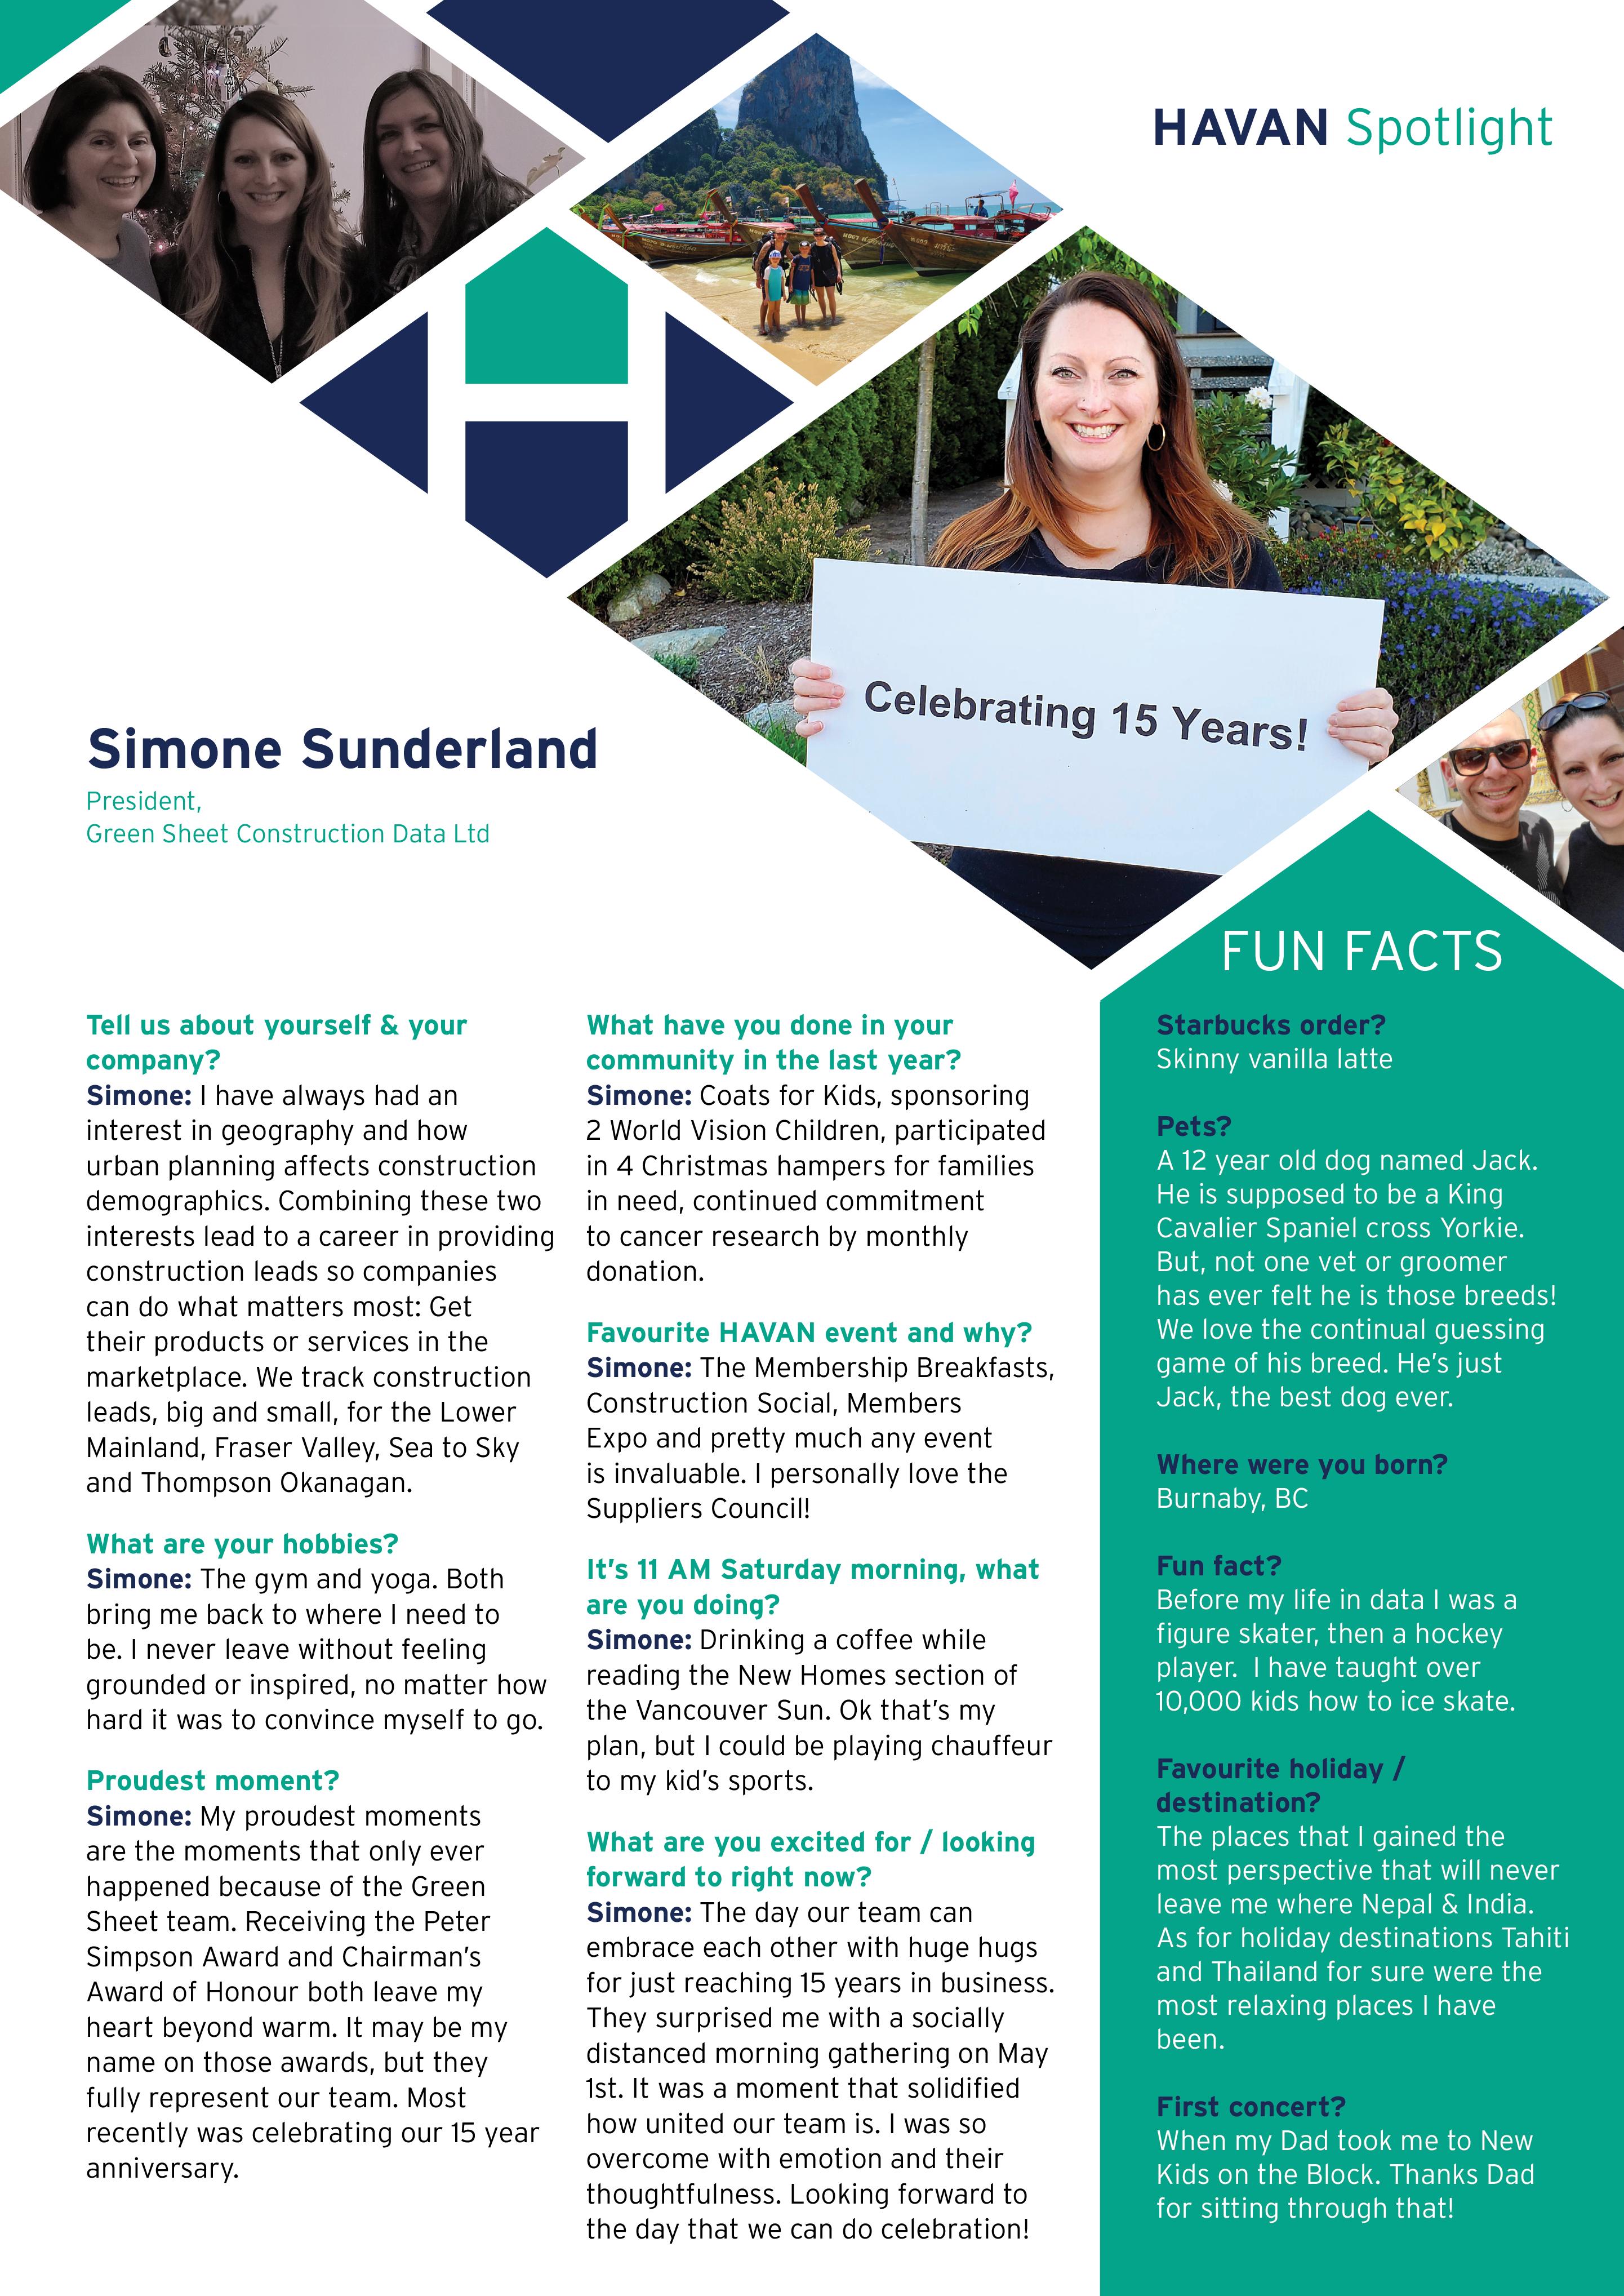 Simone Sunderland